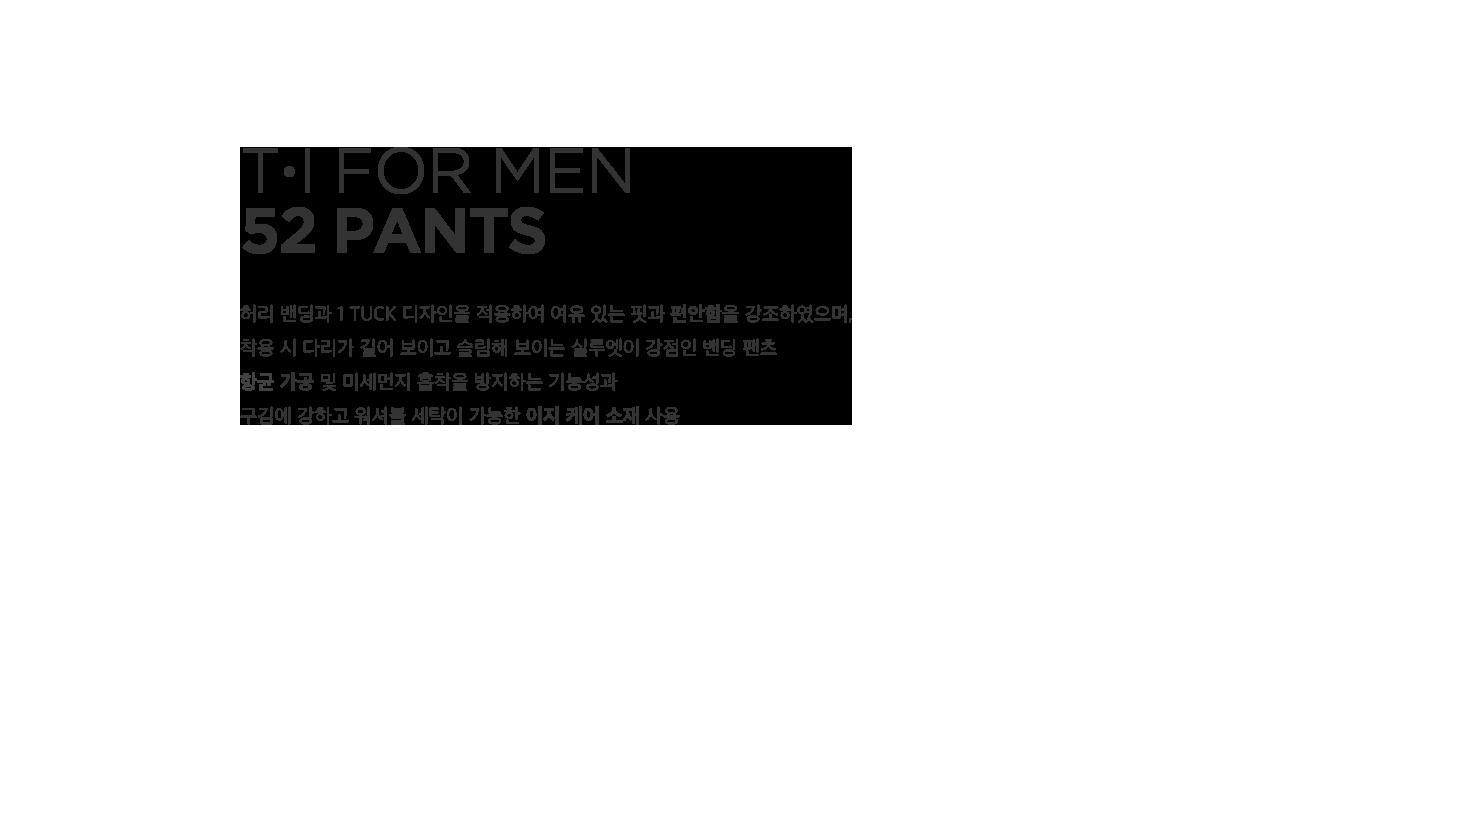 T·I FOR MEN 52 PANTS